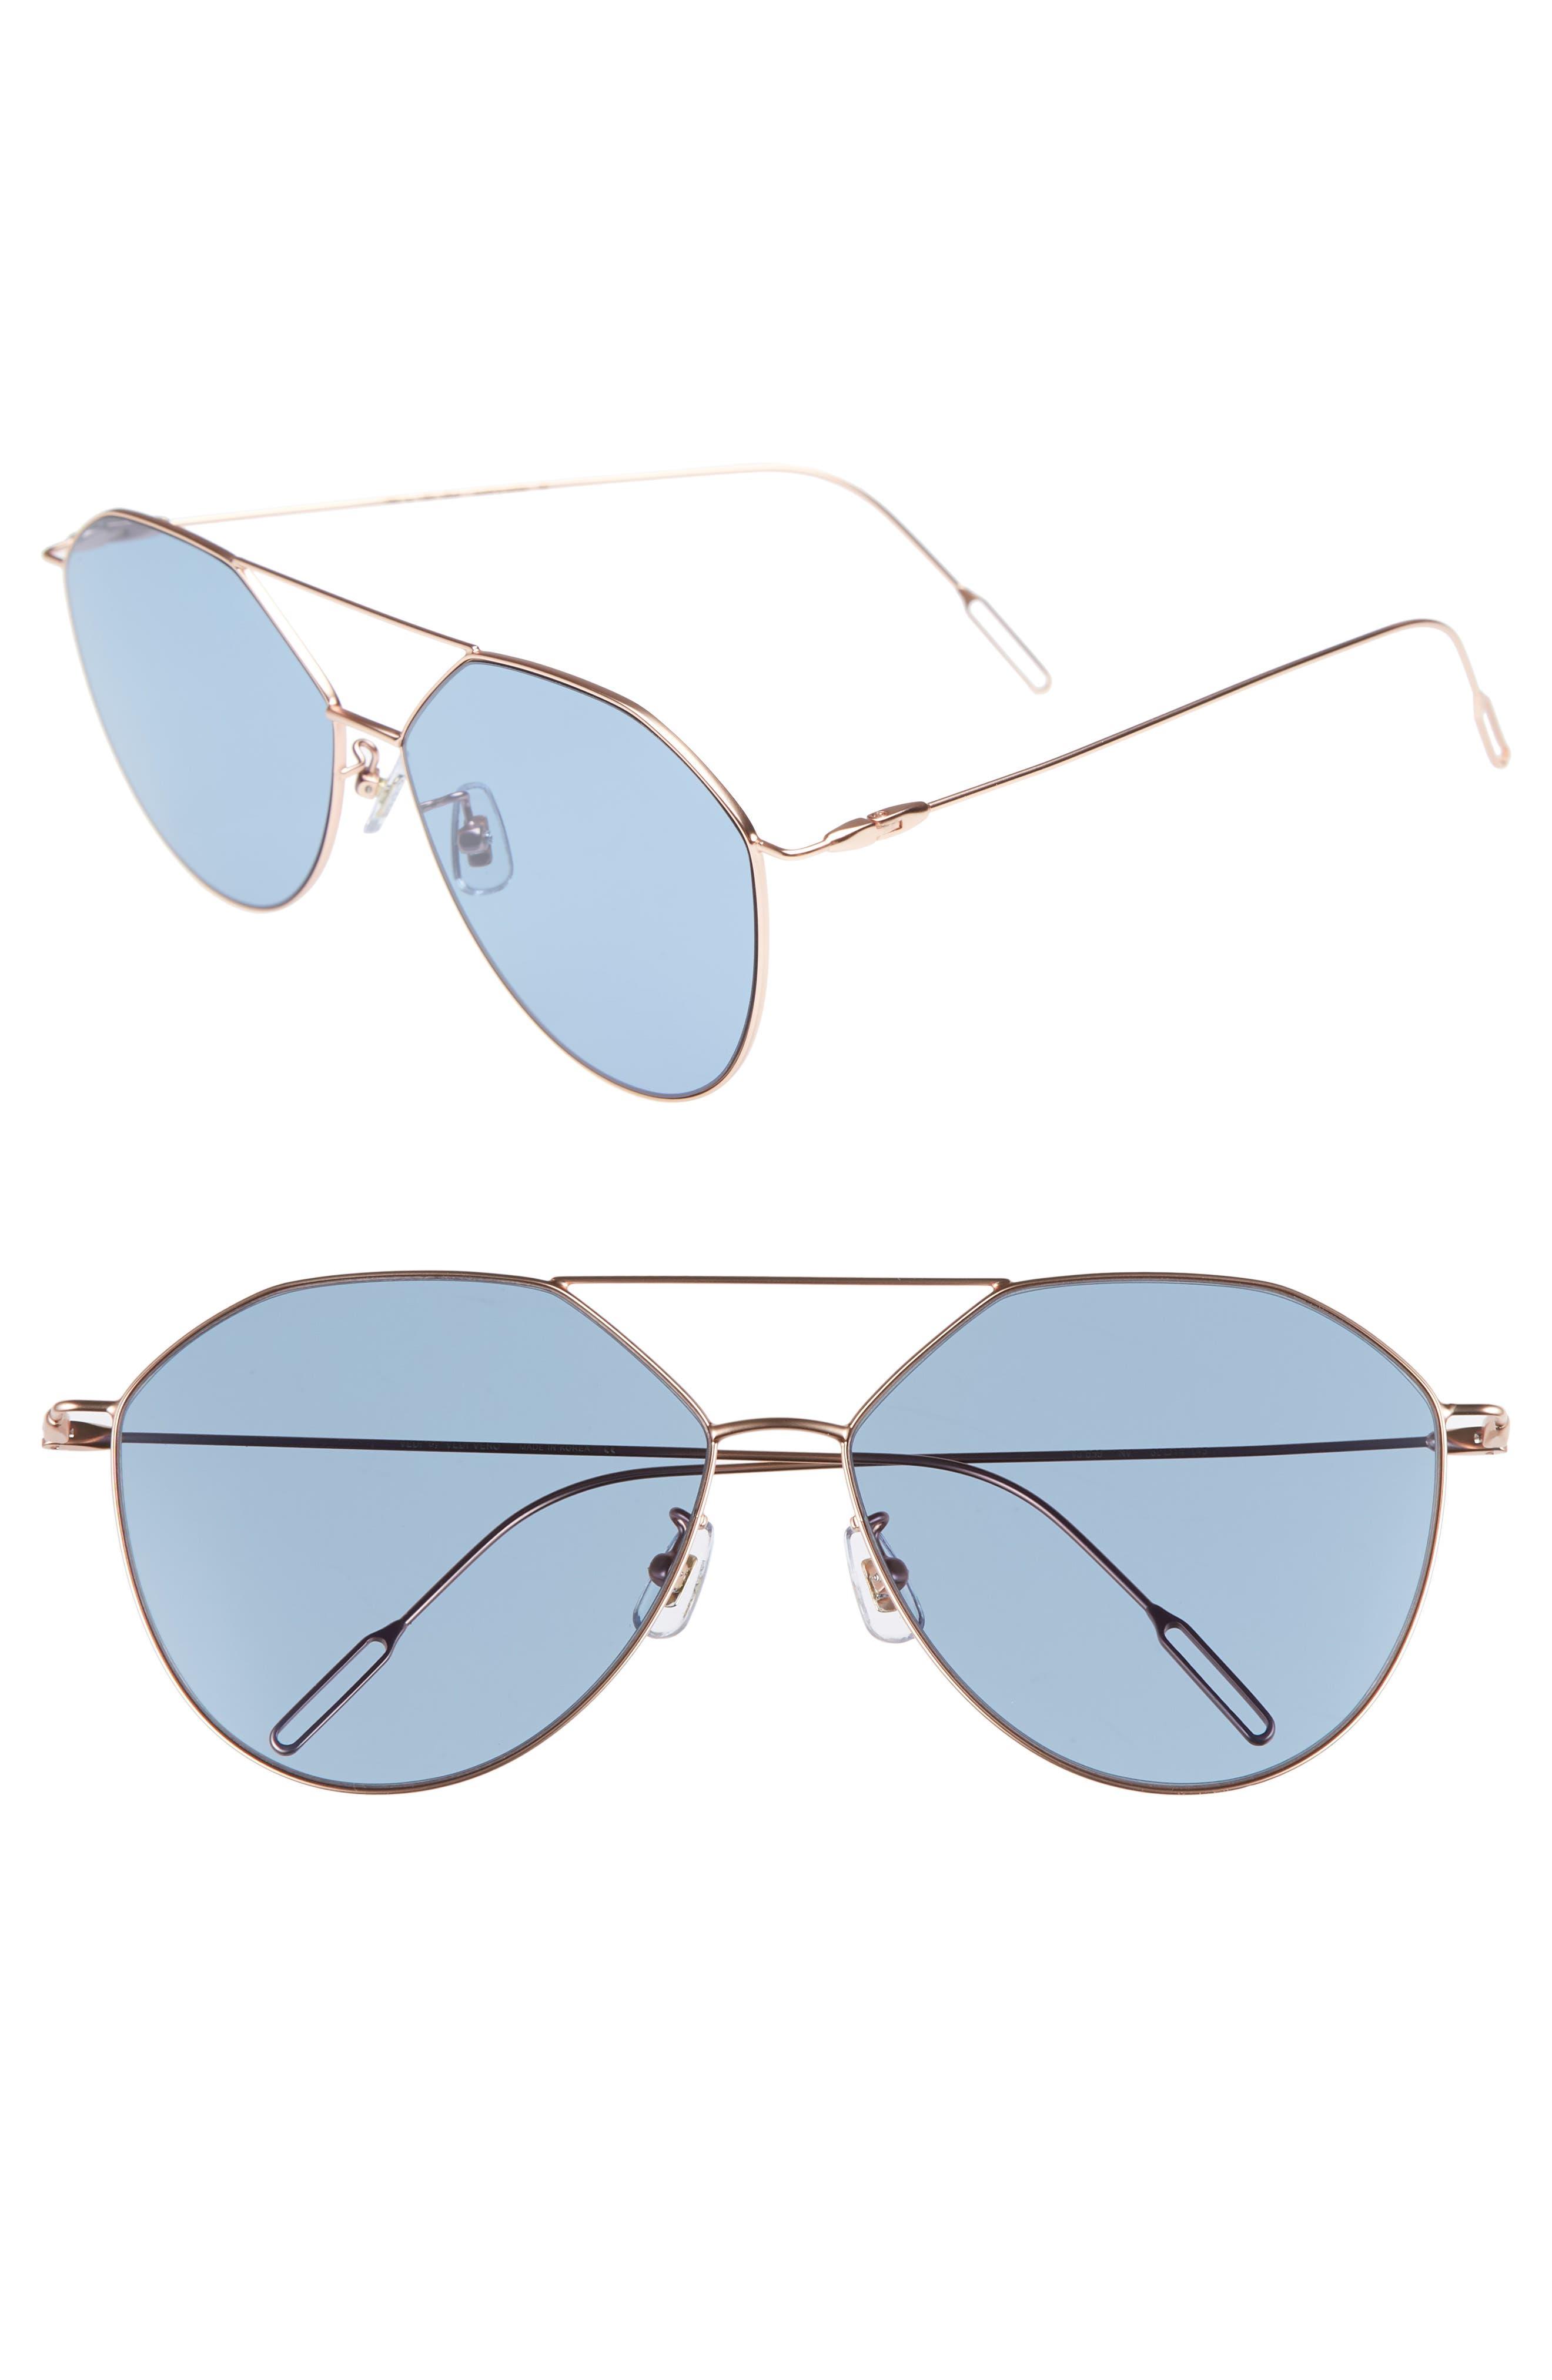 62mm Metal Oversize Aviator Sunglasses,                             Main thumbnail 1, color,                             ROSE GOLD/NAVY